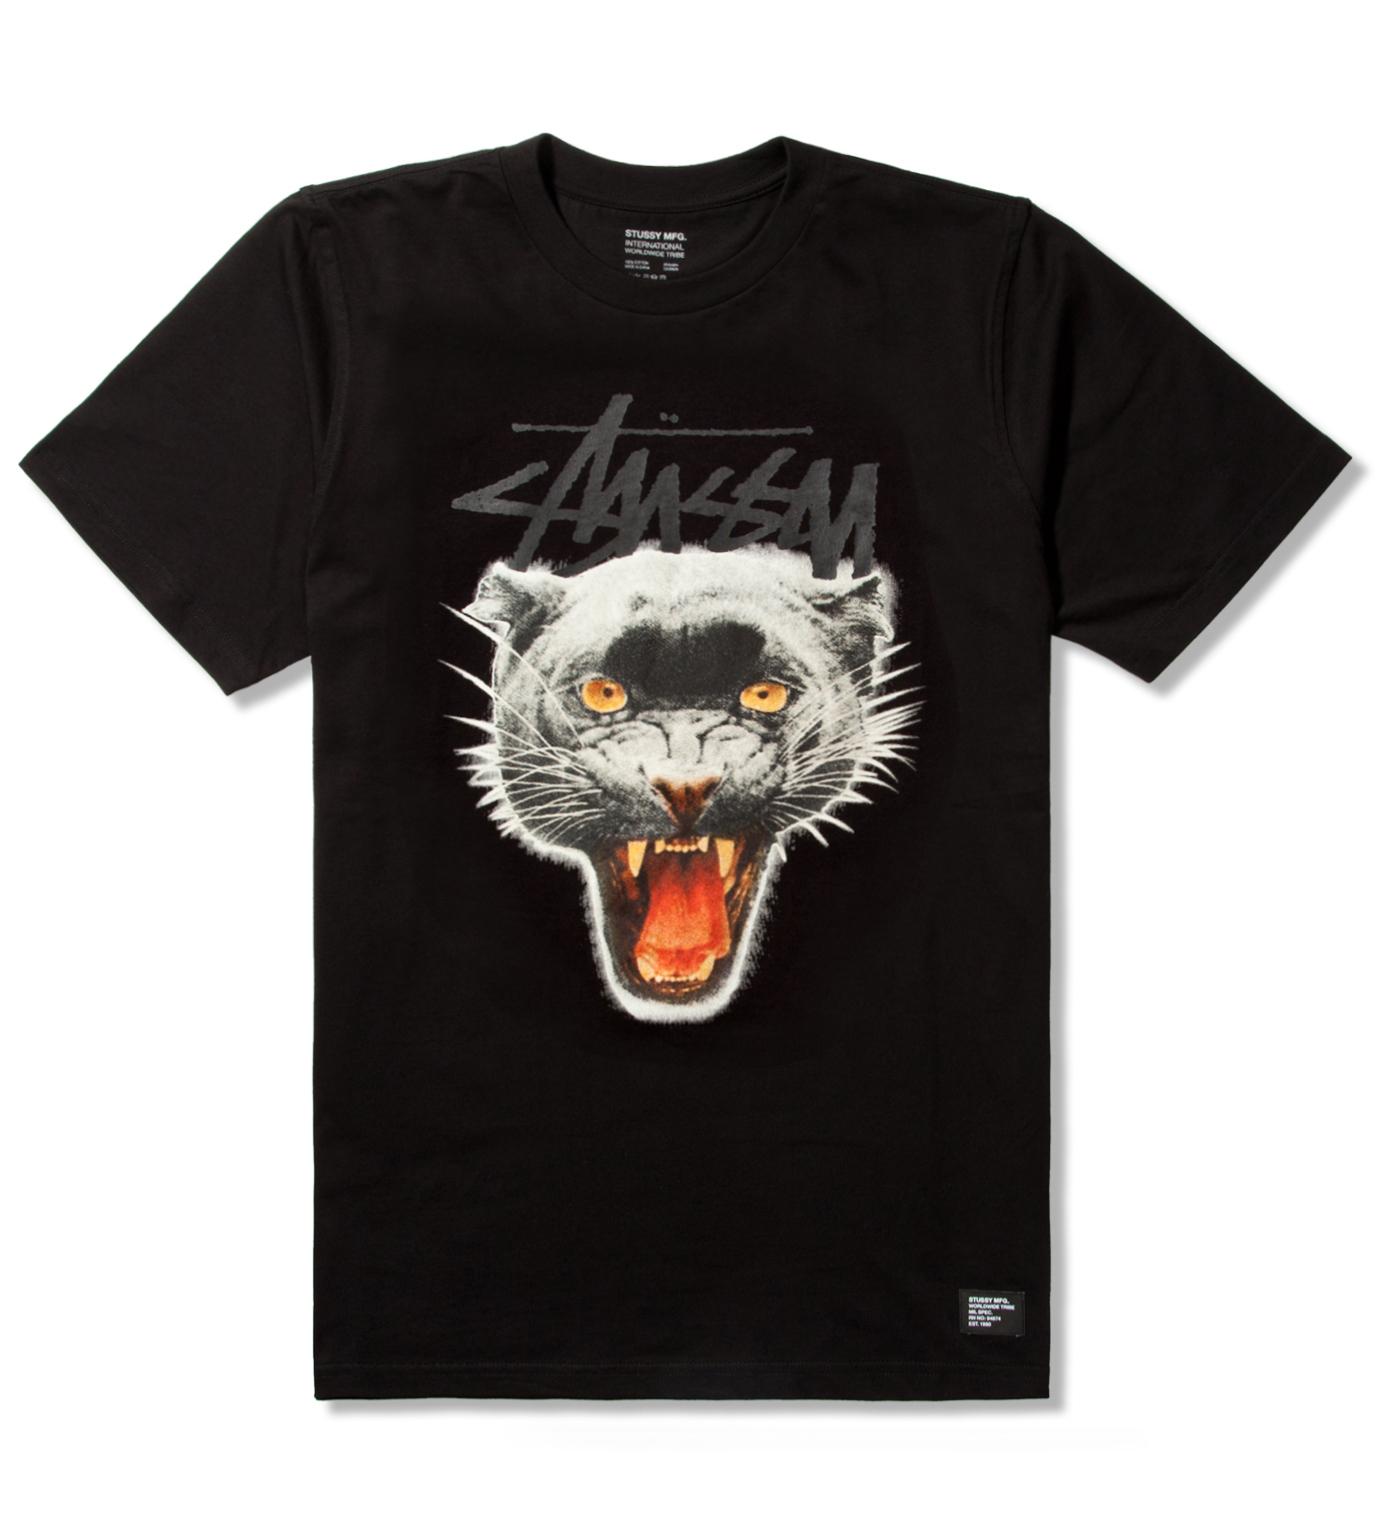 Stussy Black Panther Crew T-Shirt